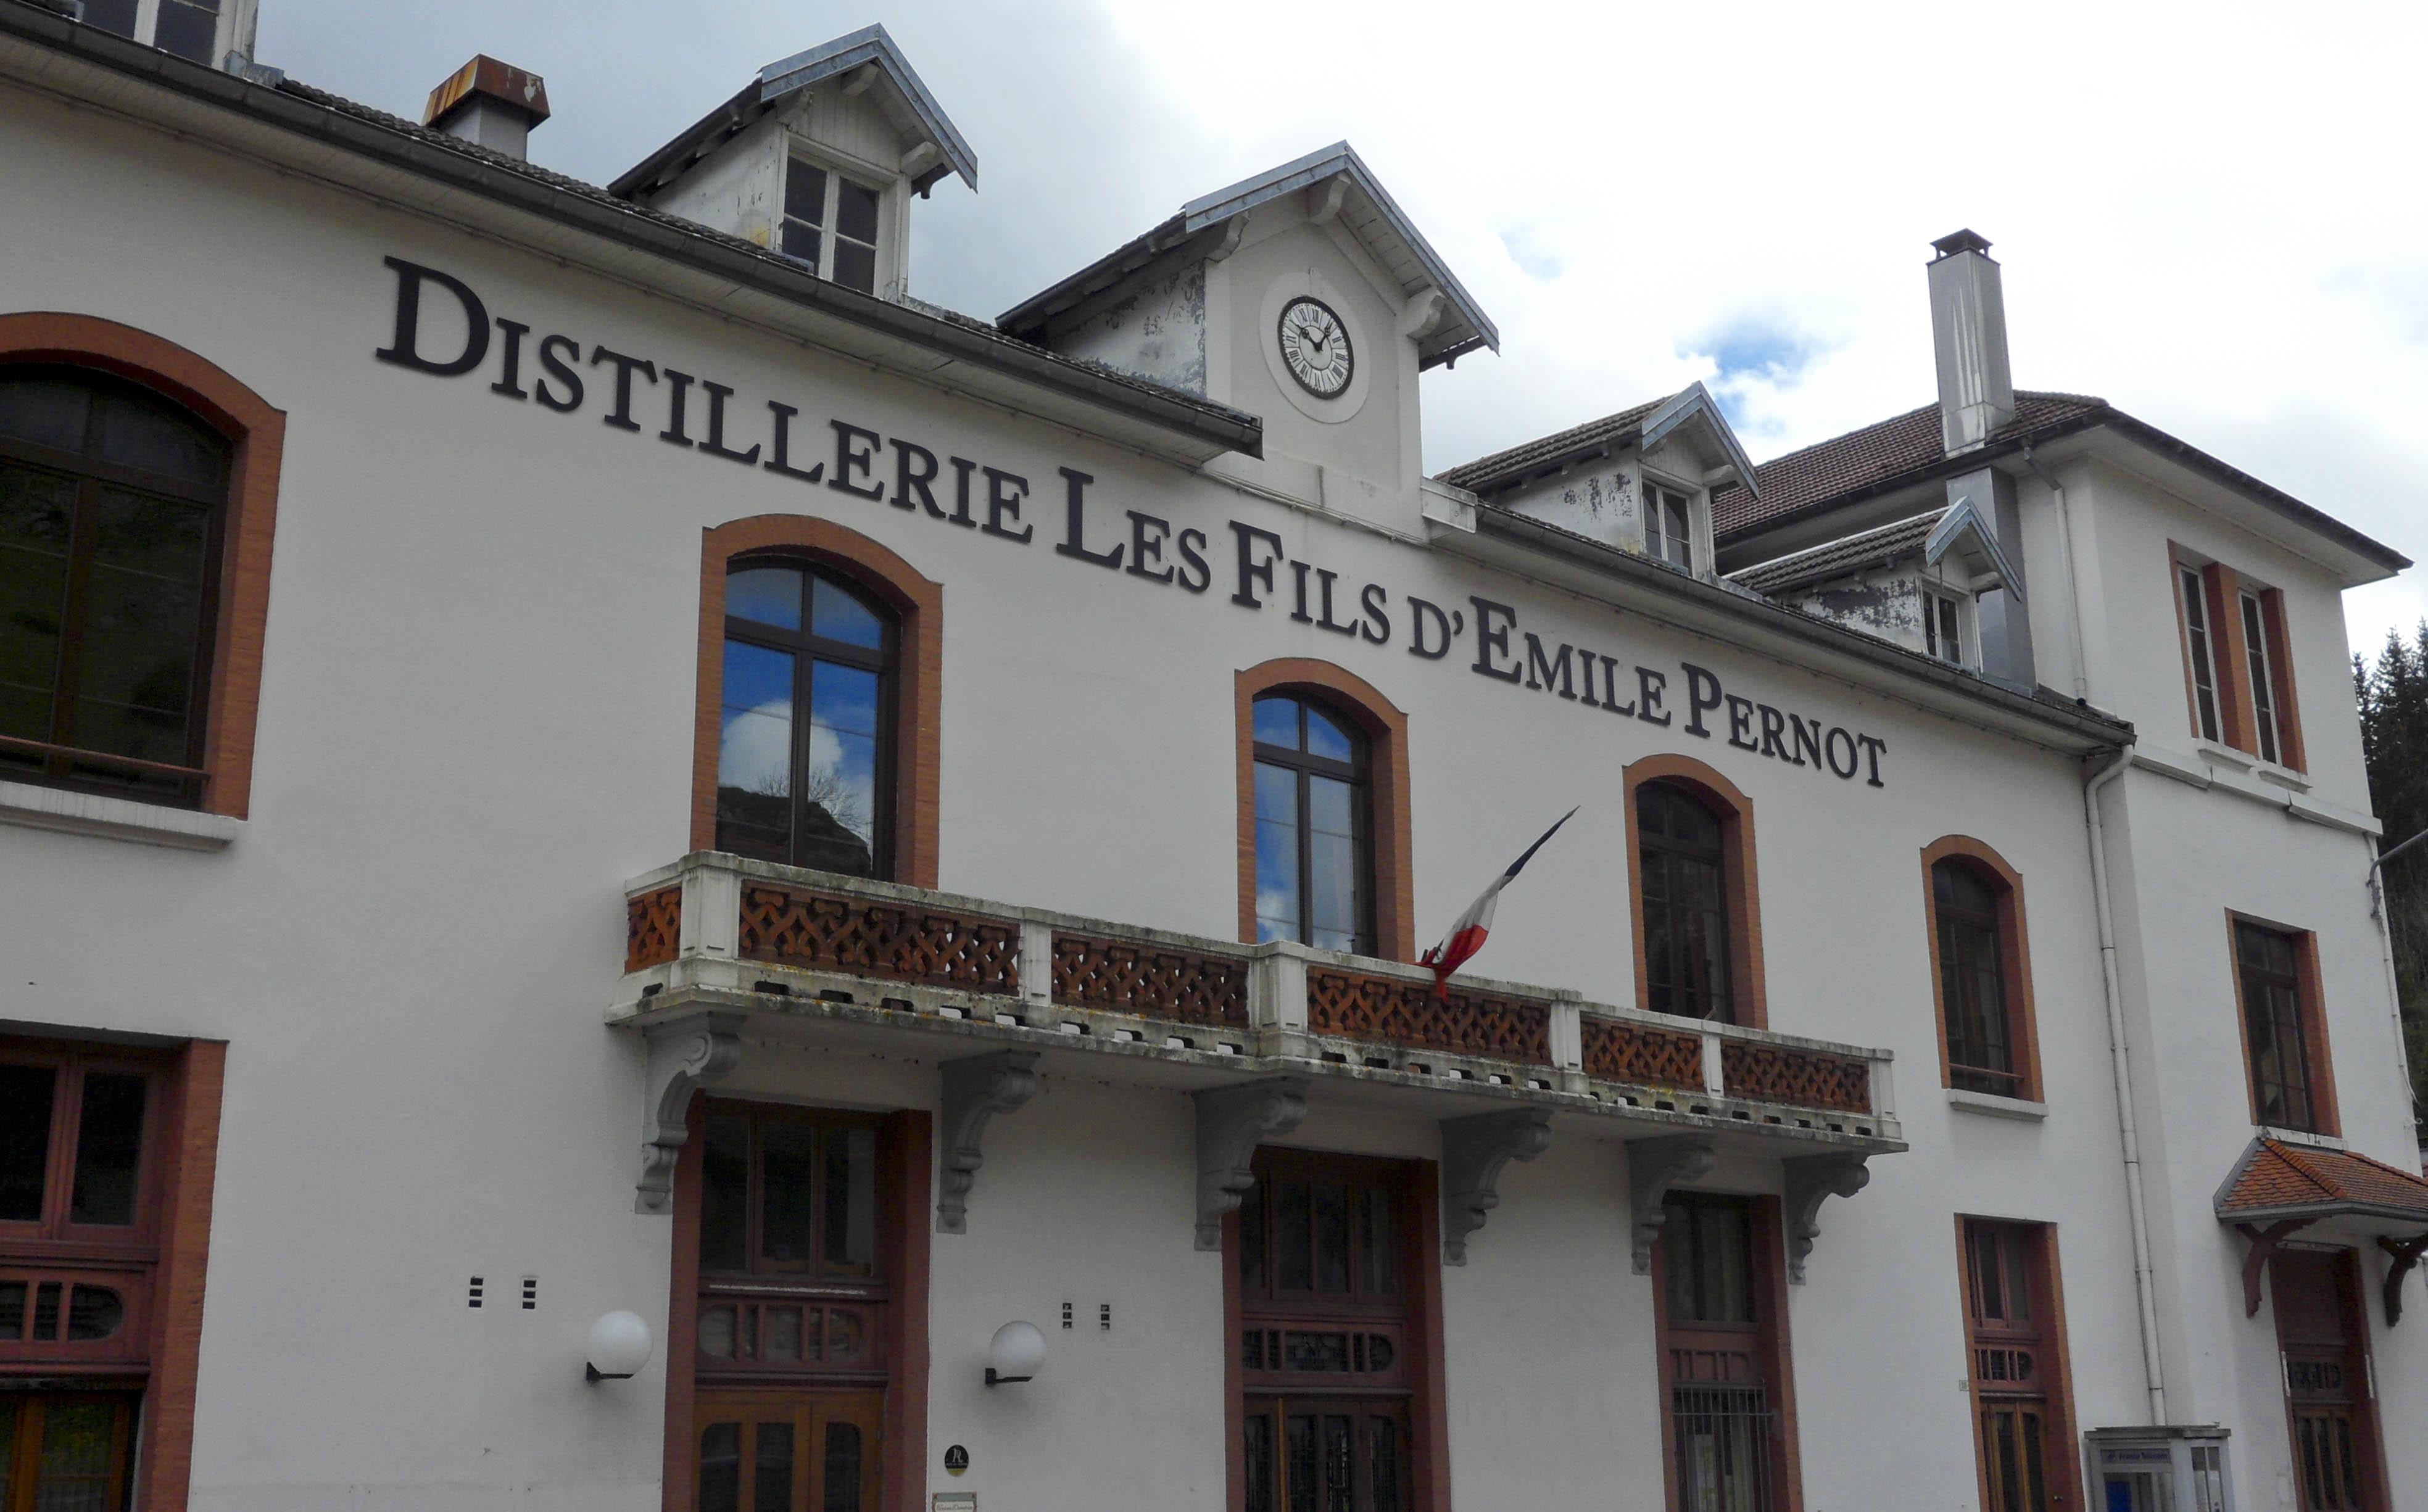 1191_distillerie_emile_pernot-4